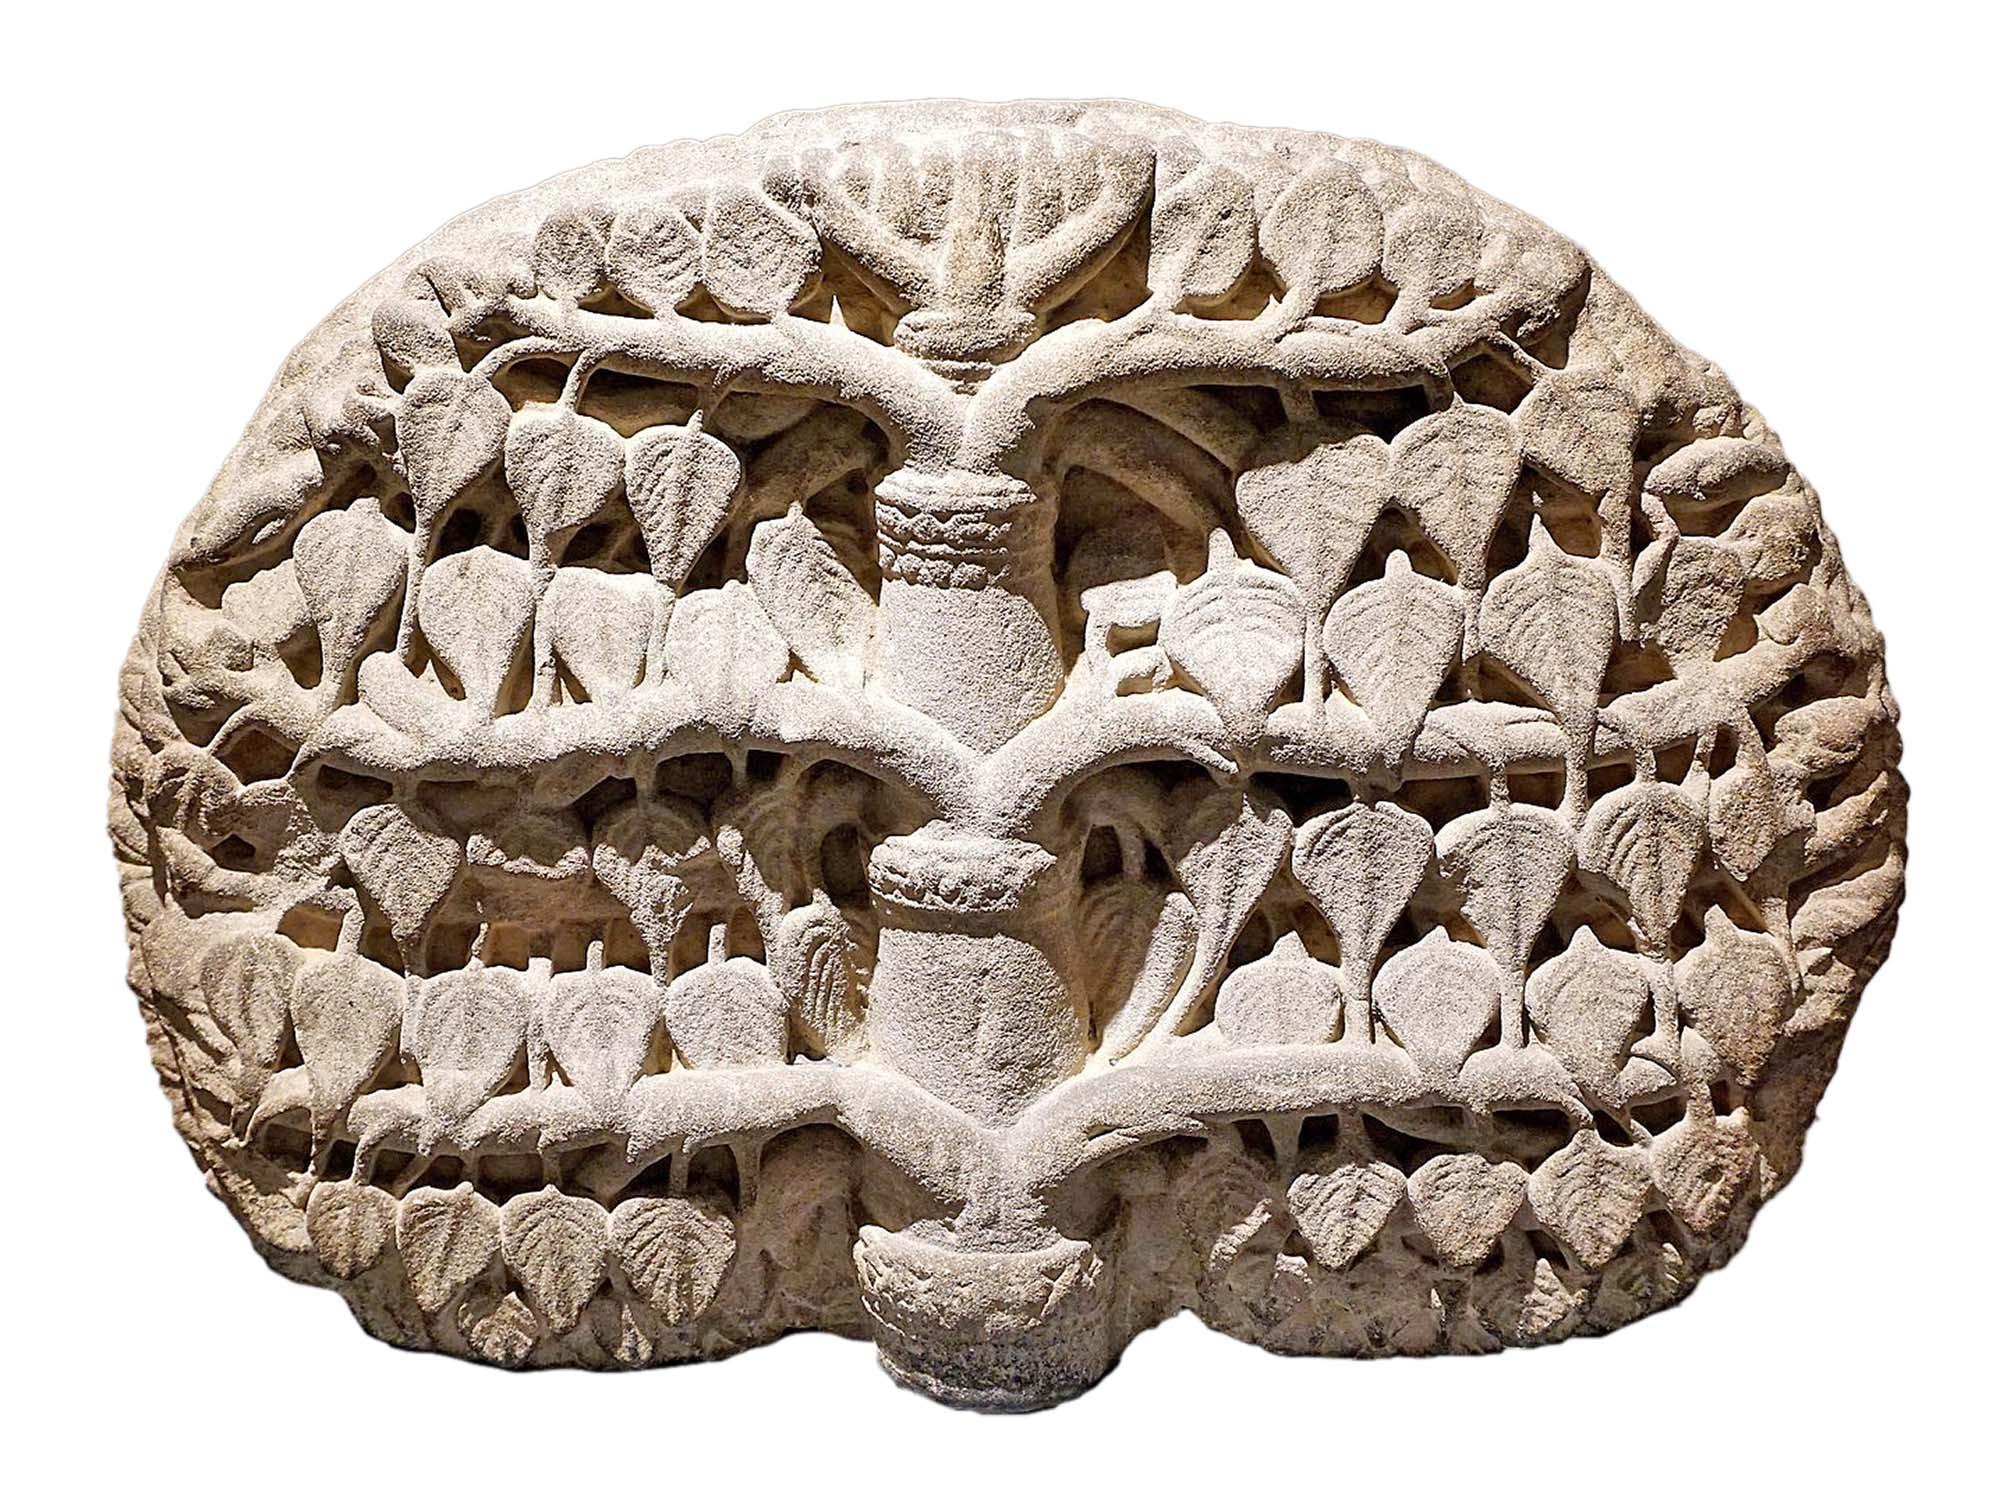 Bodhi tree, Thailand, Ayutthaya, 15th c.